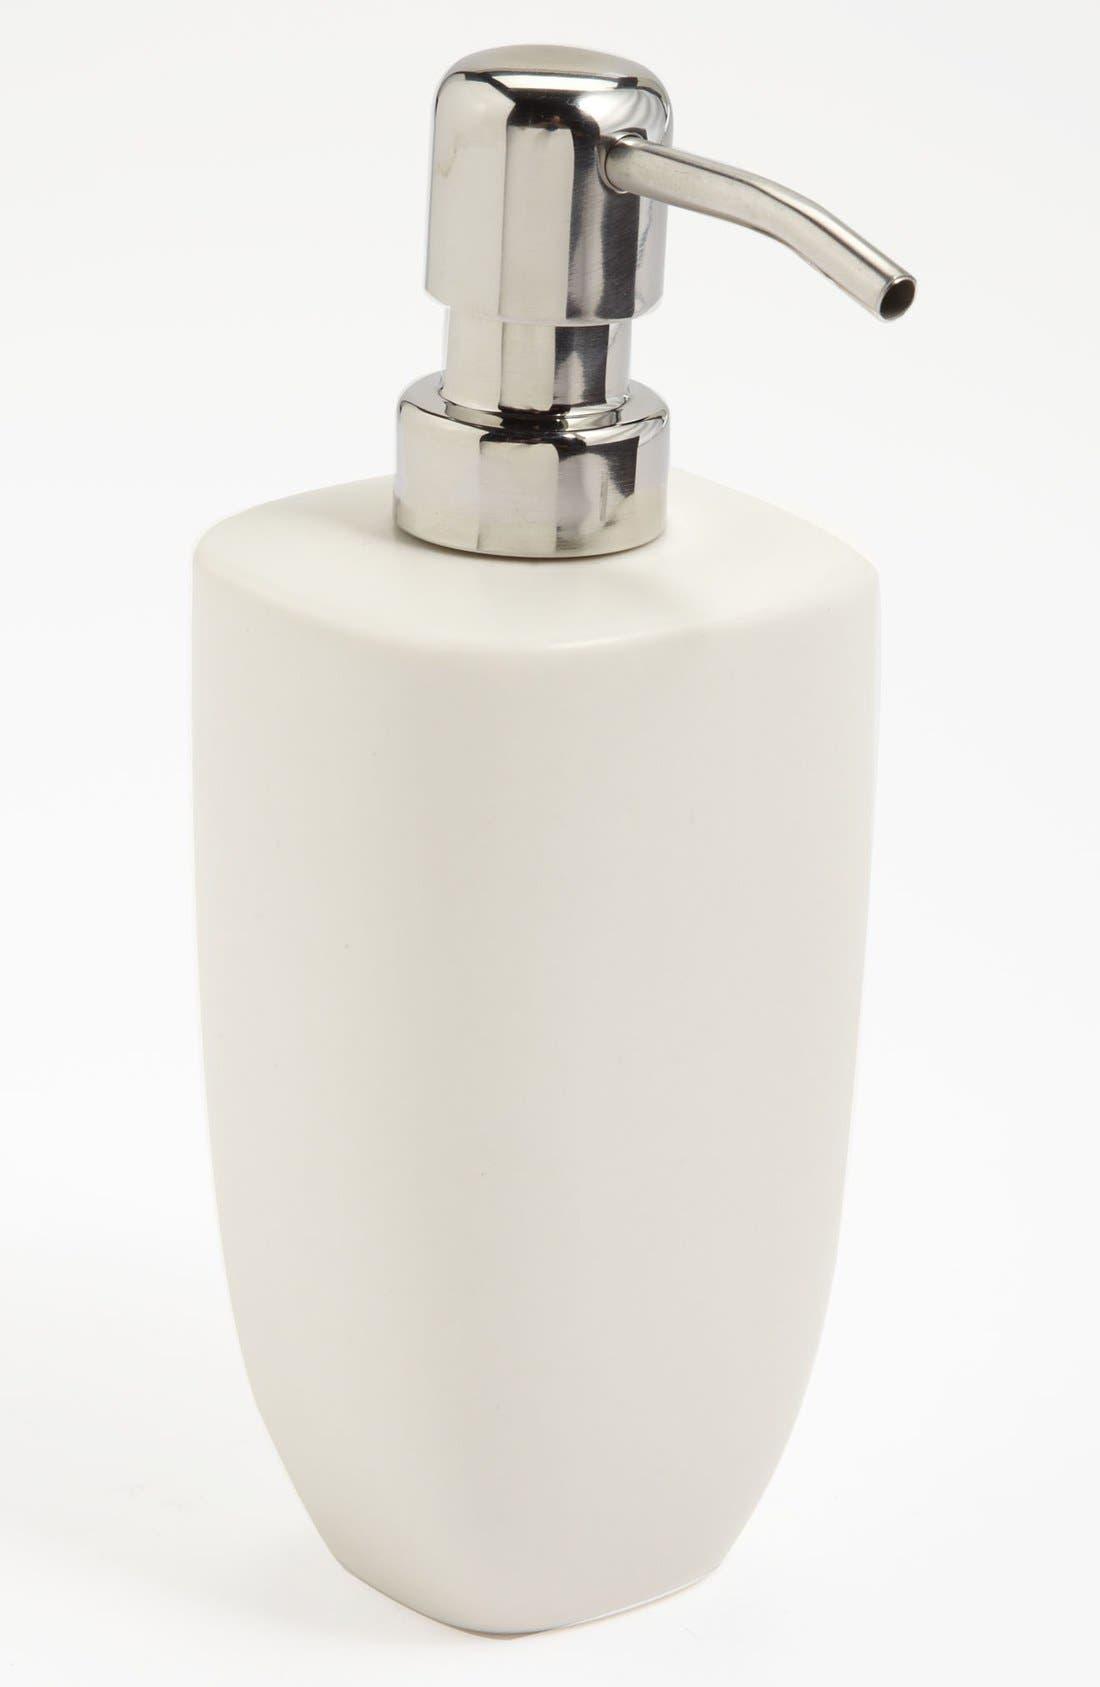 Alternate Image 1 Selected - Waterworks Studio 'Modern Ceramic' Soap Dispenser (Online Only)